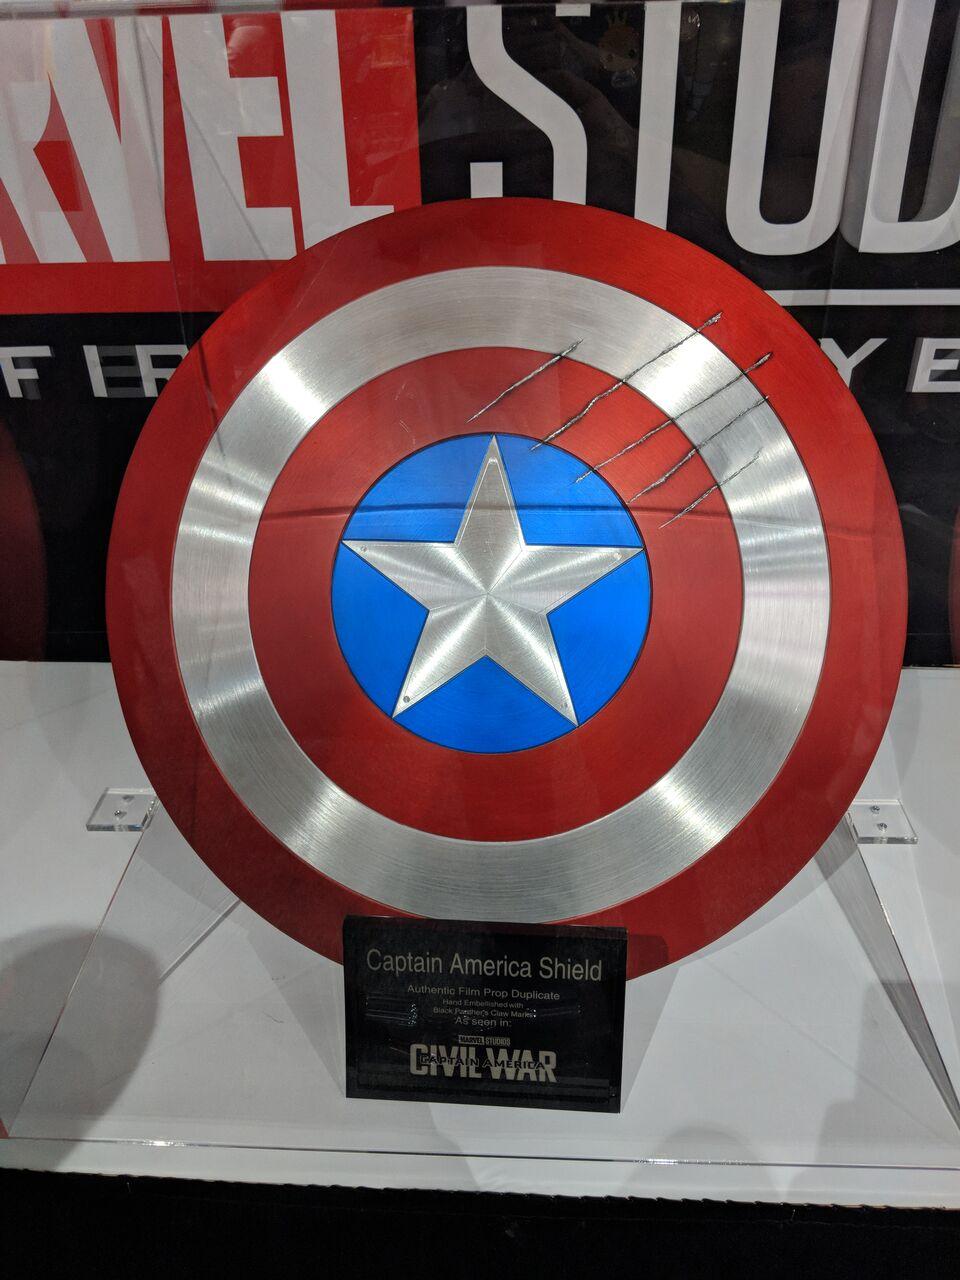 CAPTAIN AMERICA'S shield from  Captain America: Civil War